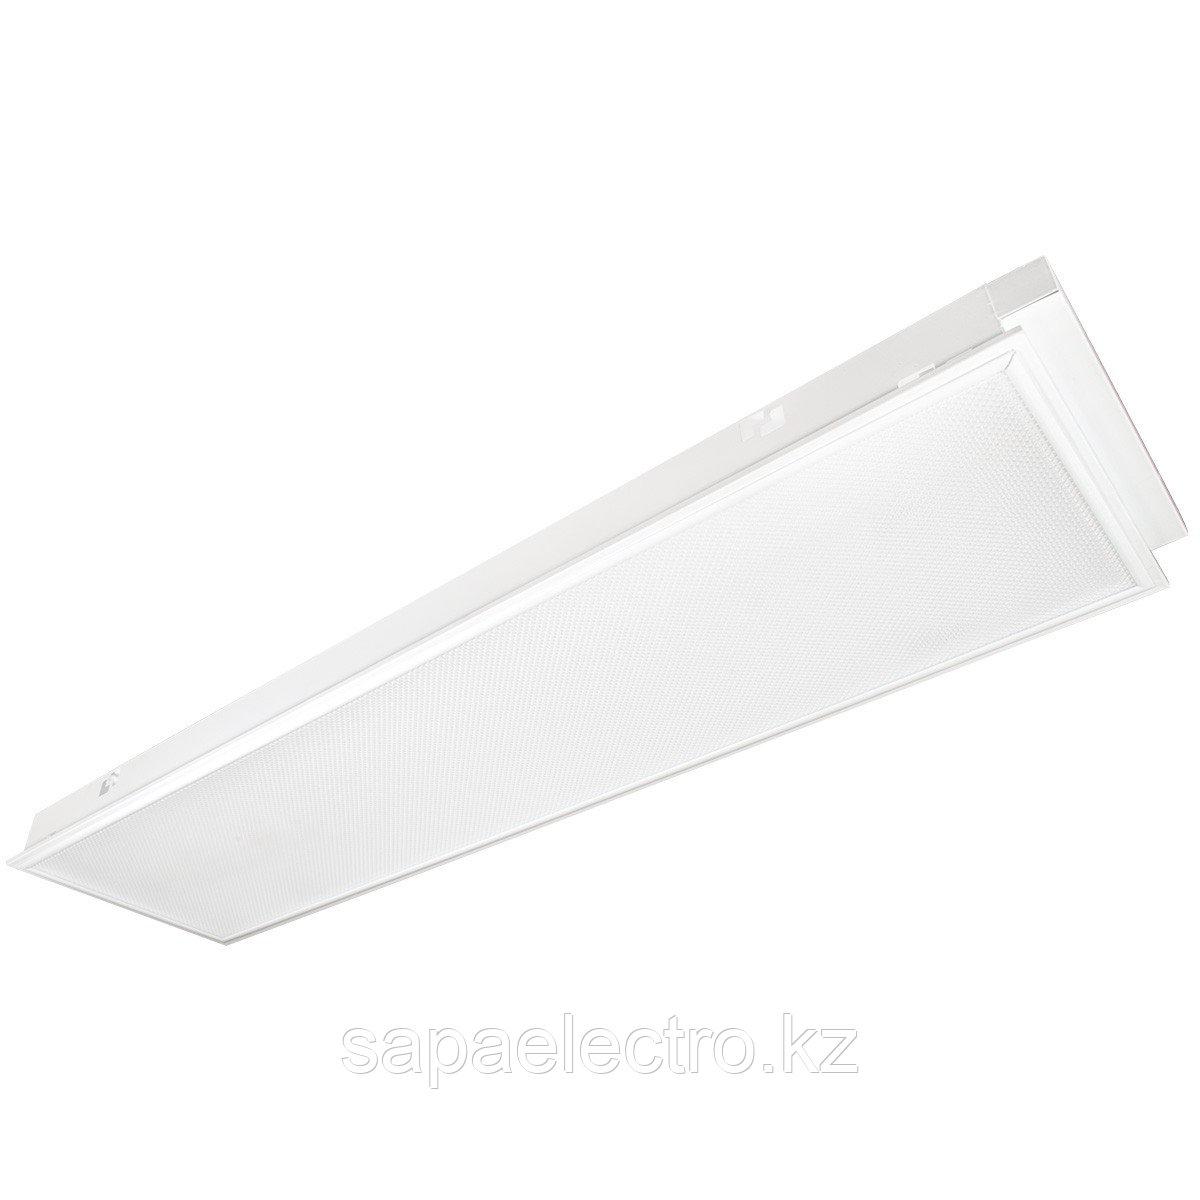 Cв-к PRIZMALED 10X9W/LZV 236 встр-й. MEGALUX